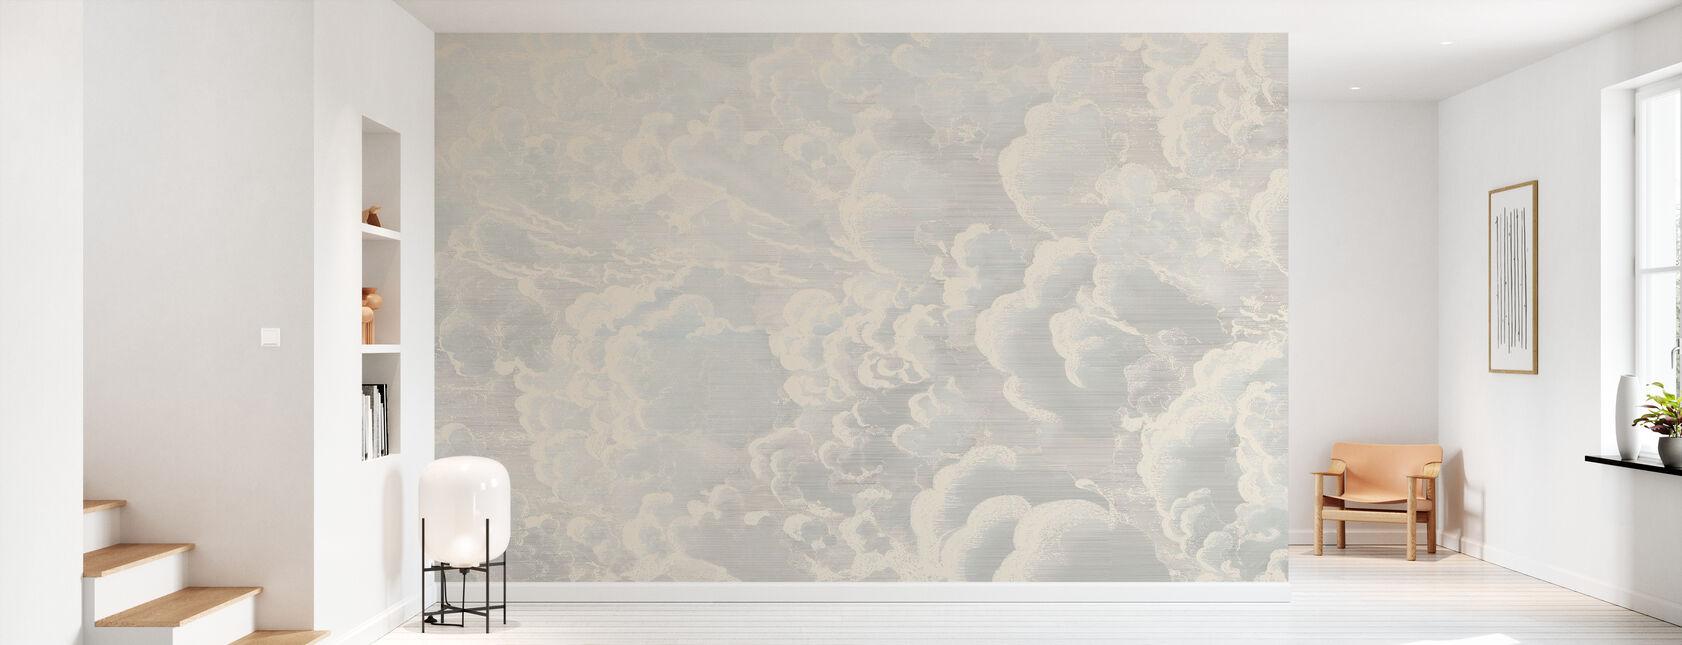 Cradled in Clouds - Wallpaper - Hallway